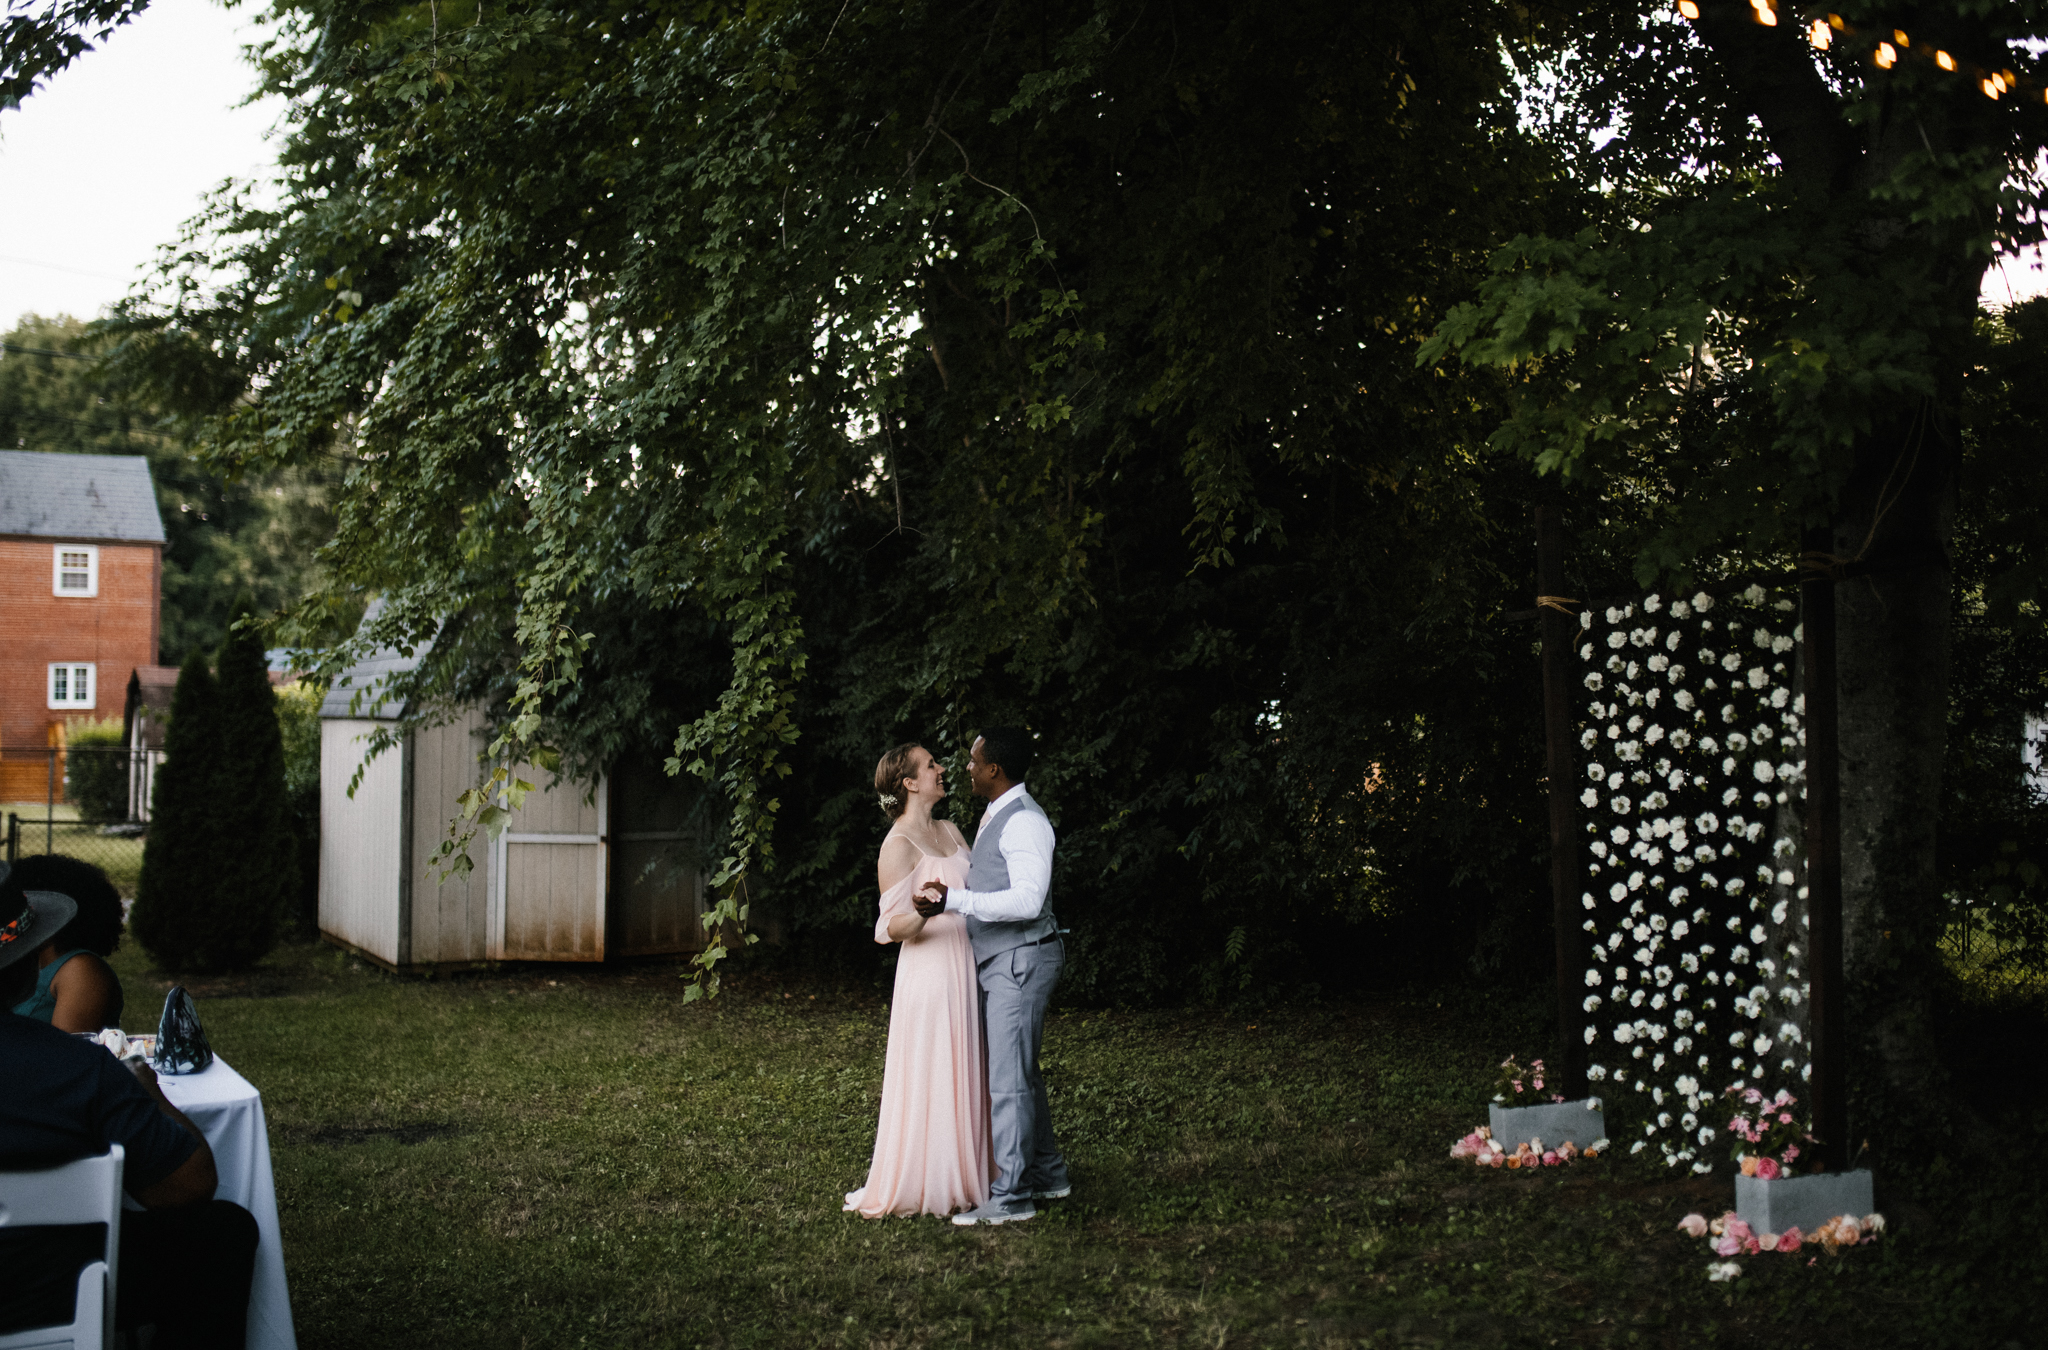 dorota_dwight_richmond_backyard_wedding-92.jpg